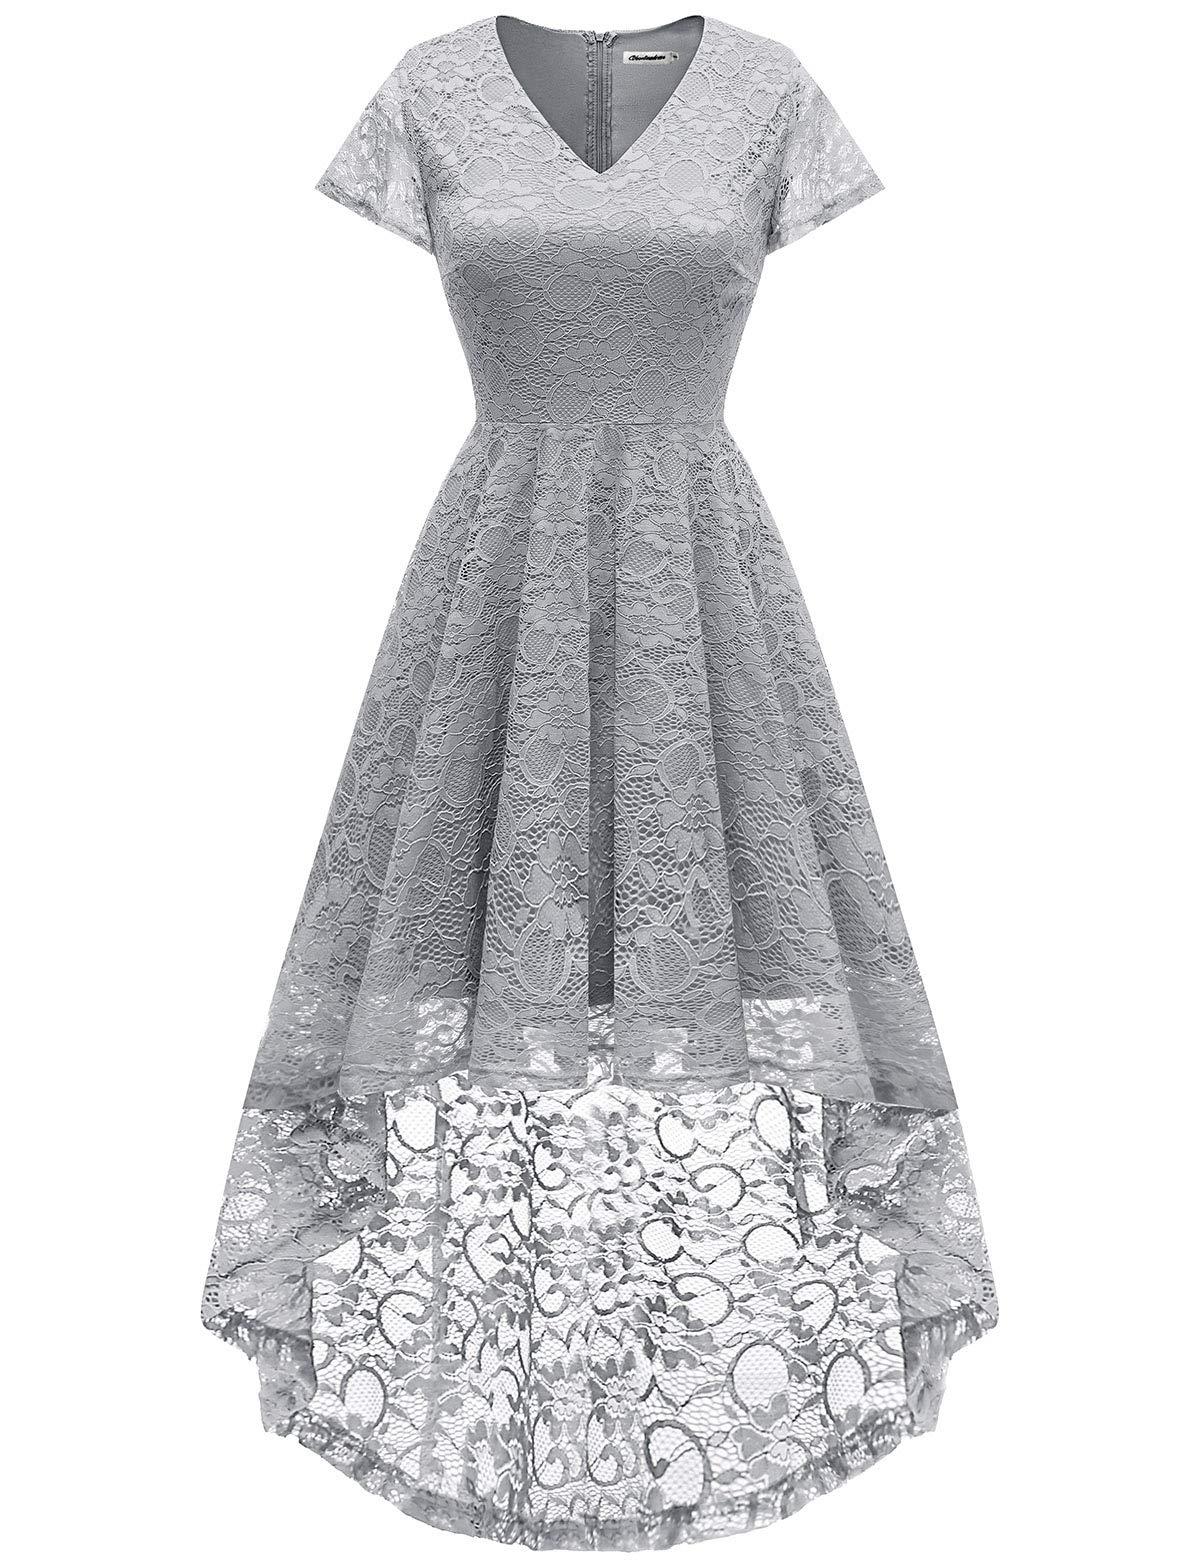 Bbonlinedress Women's Vintage Floral Lace Hi-Lo Cap Sleeve Formal Cocktail Prom Party Dress Grey XL